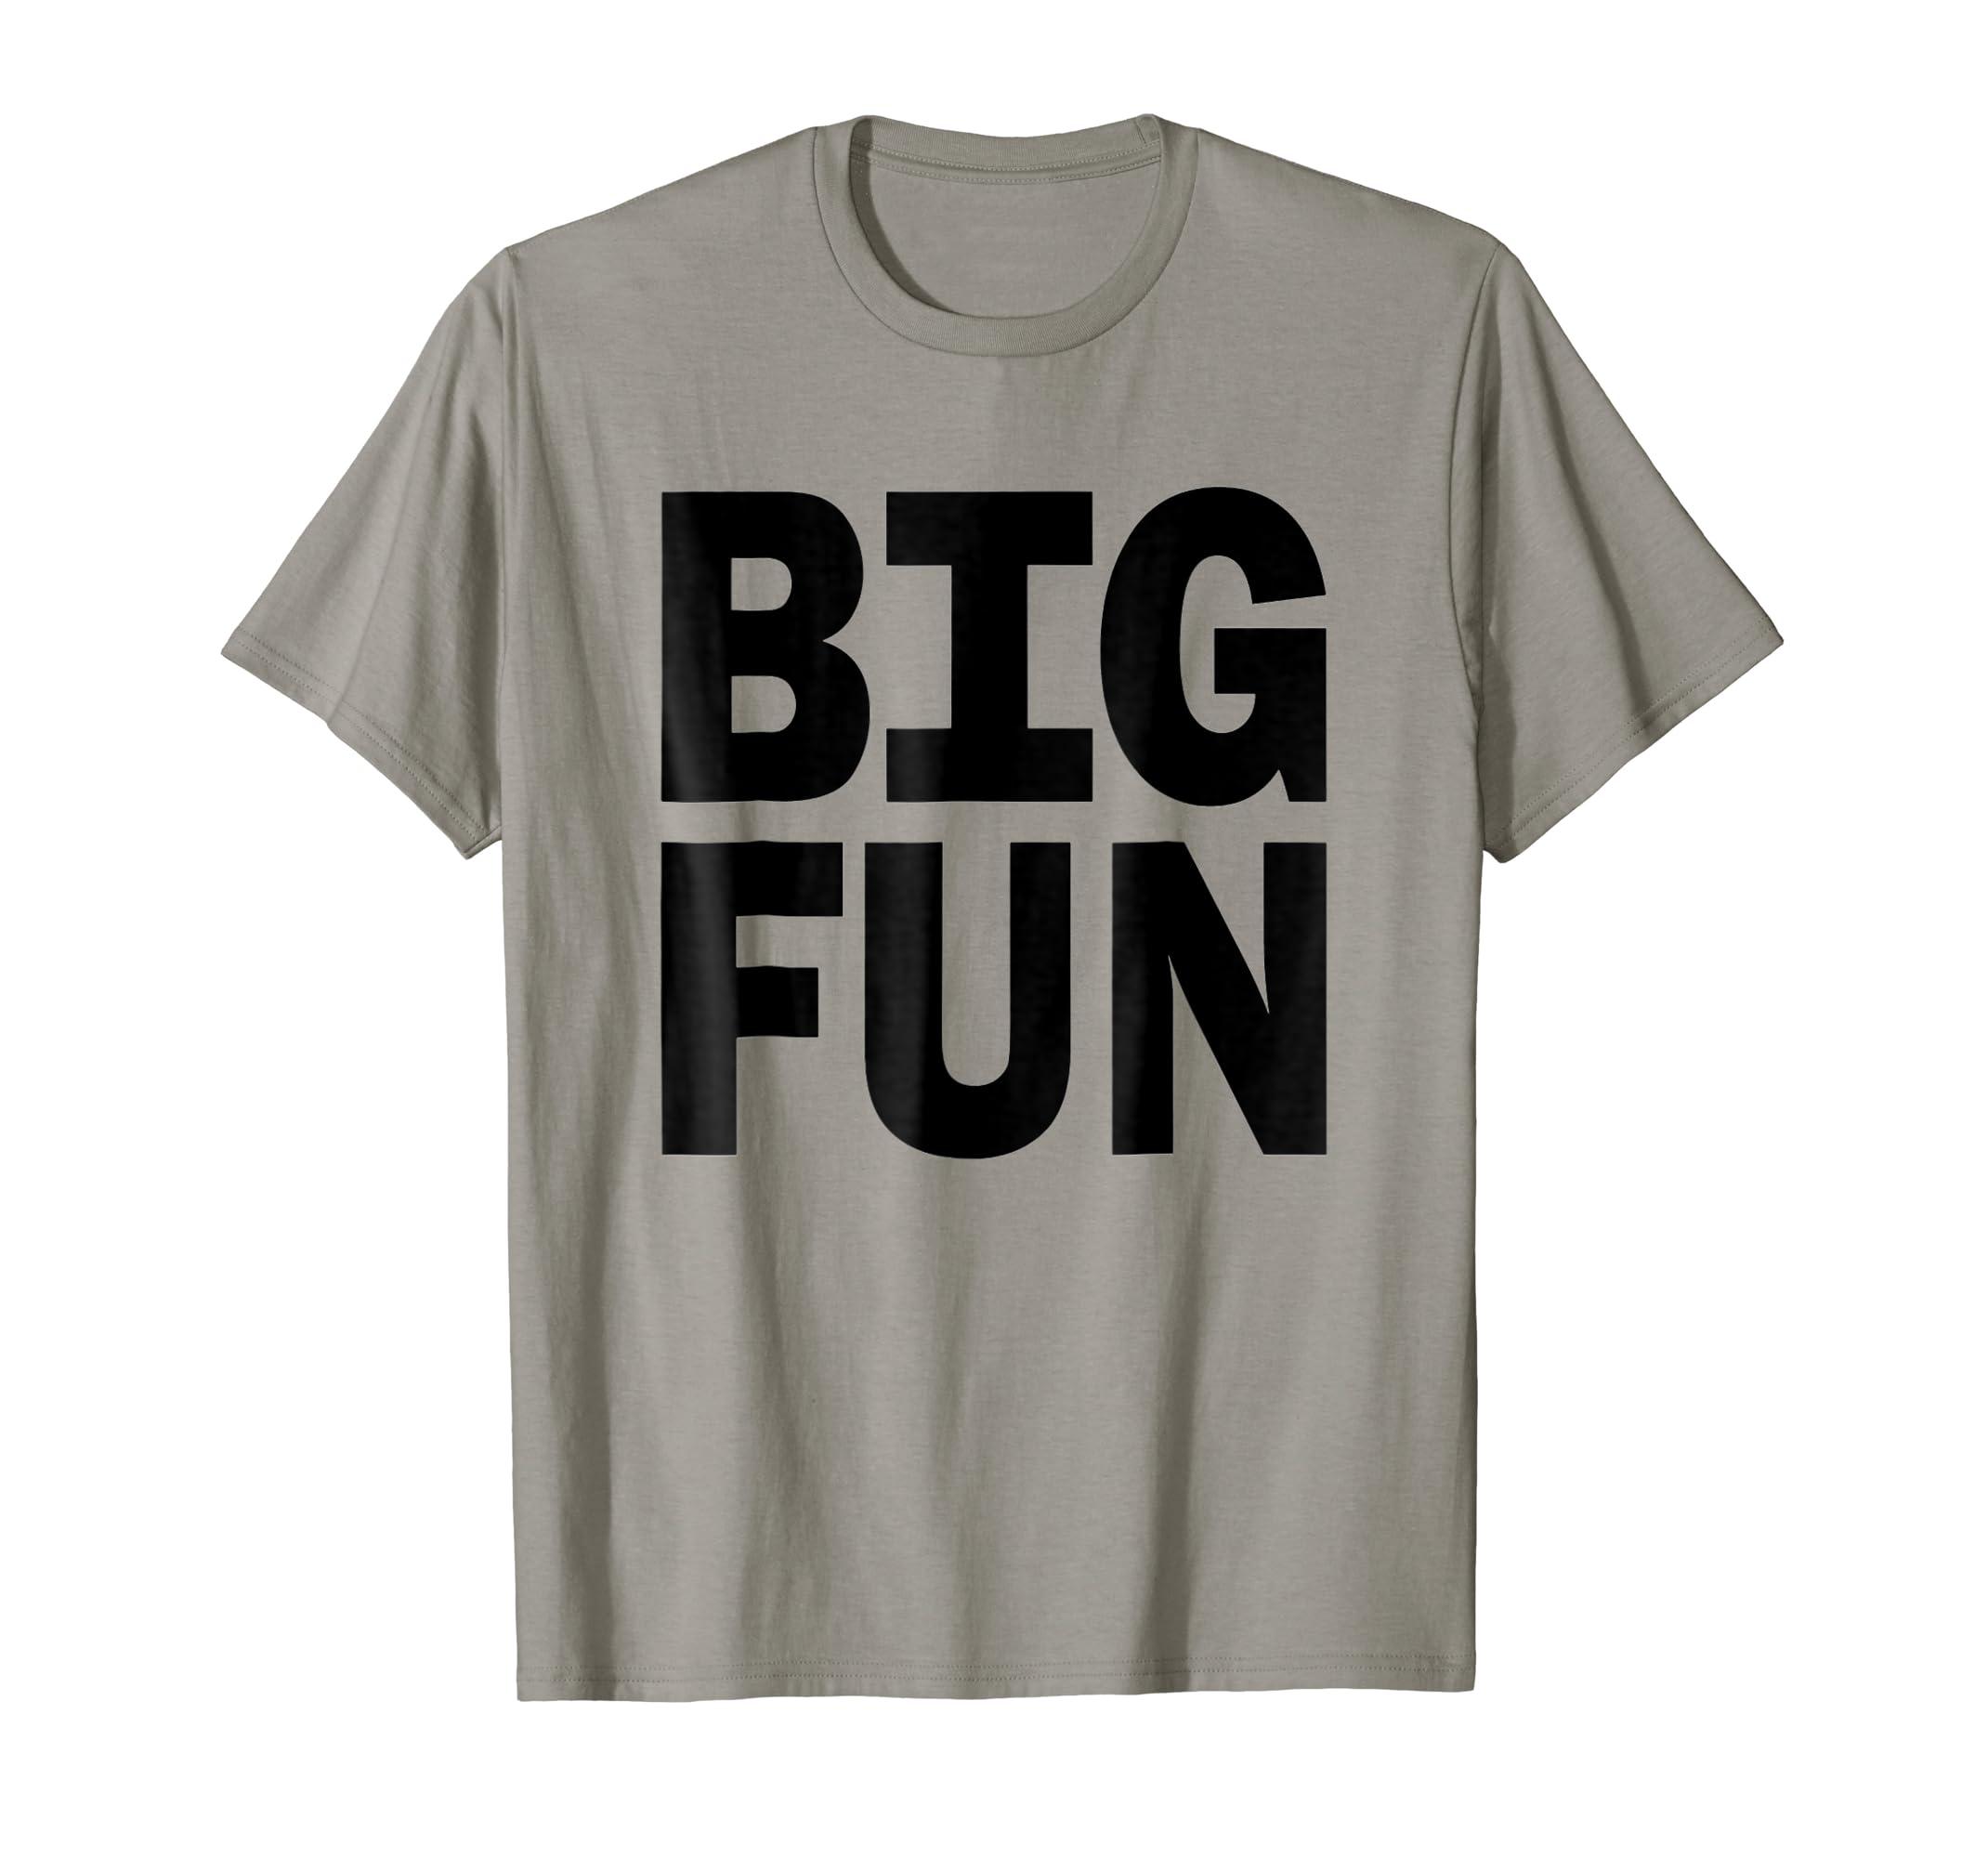 63be43109 Amazon.com: Big Fun - Heather T Shirt: Clothing